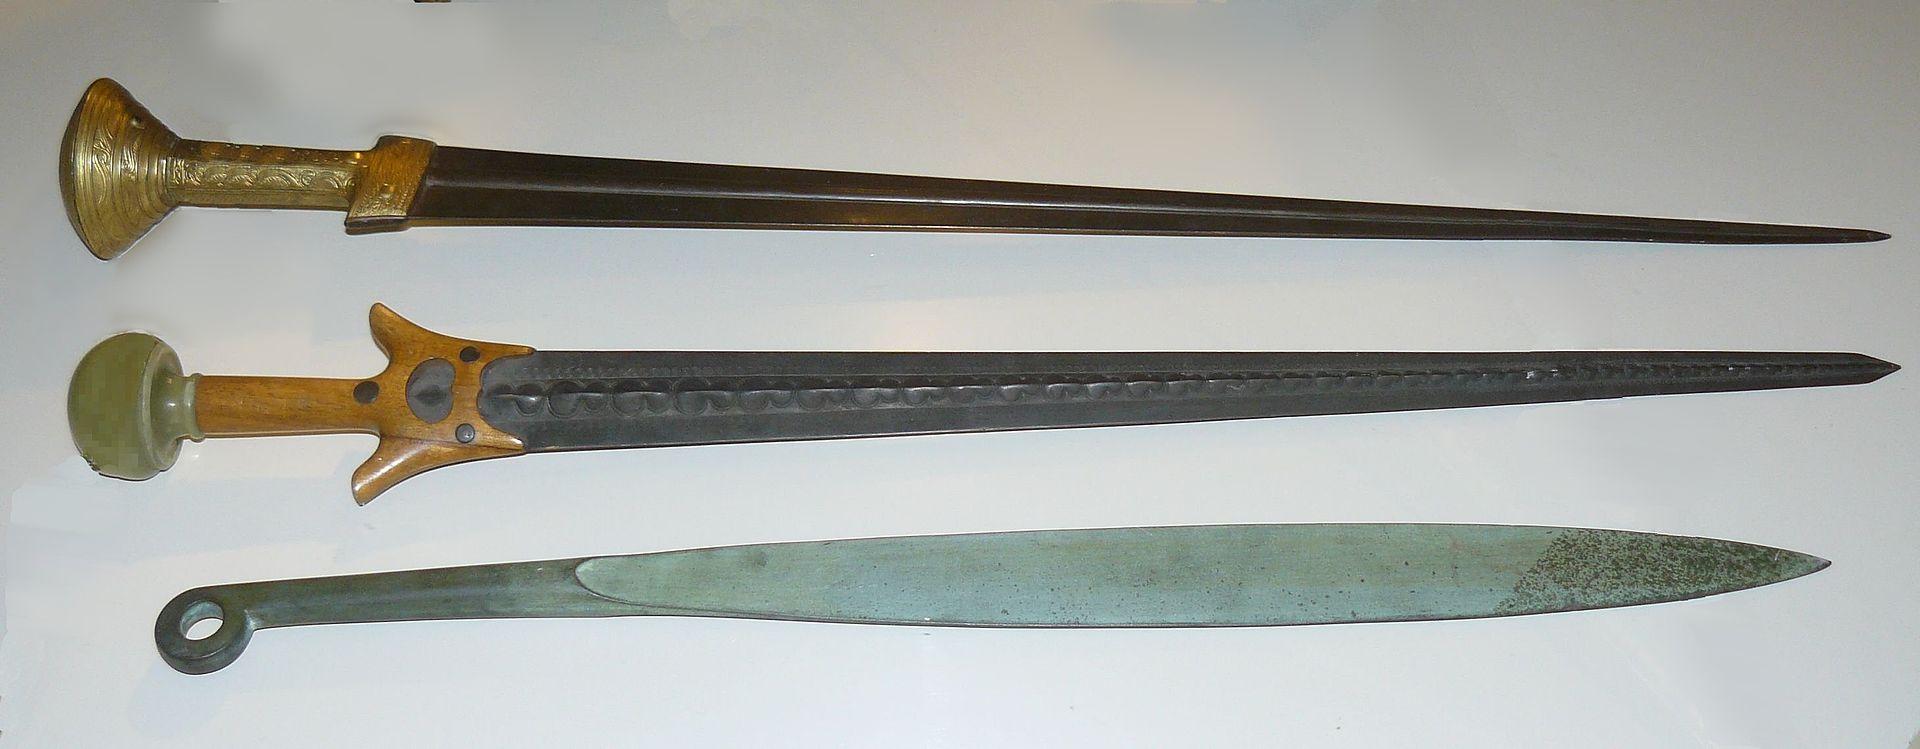 Mycenaean_swords_recostruction.jpg